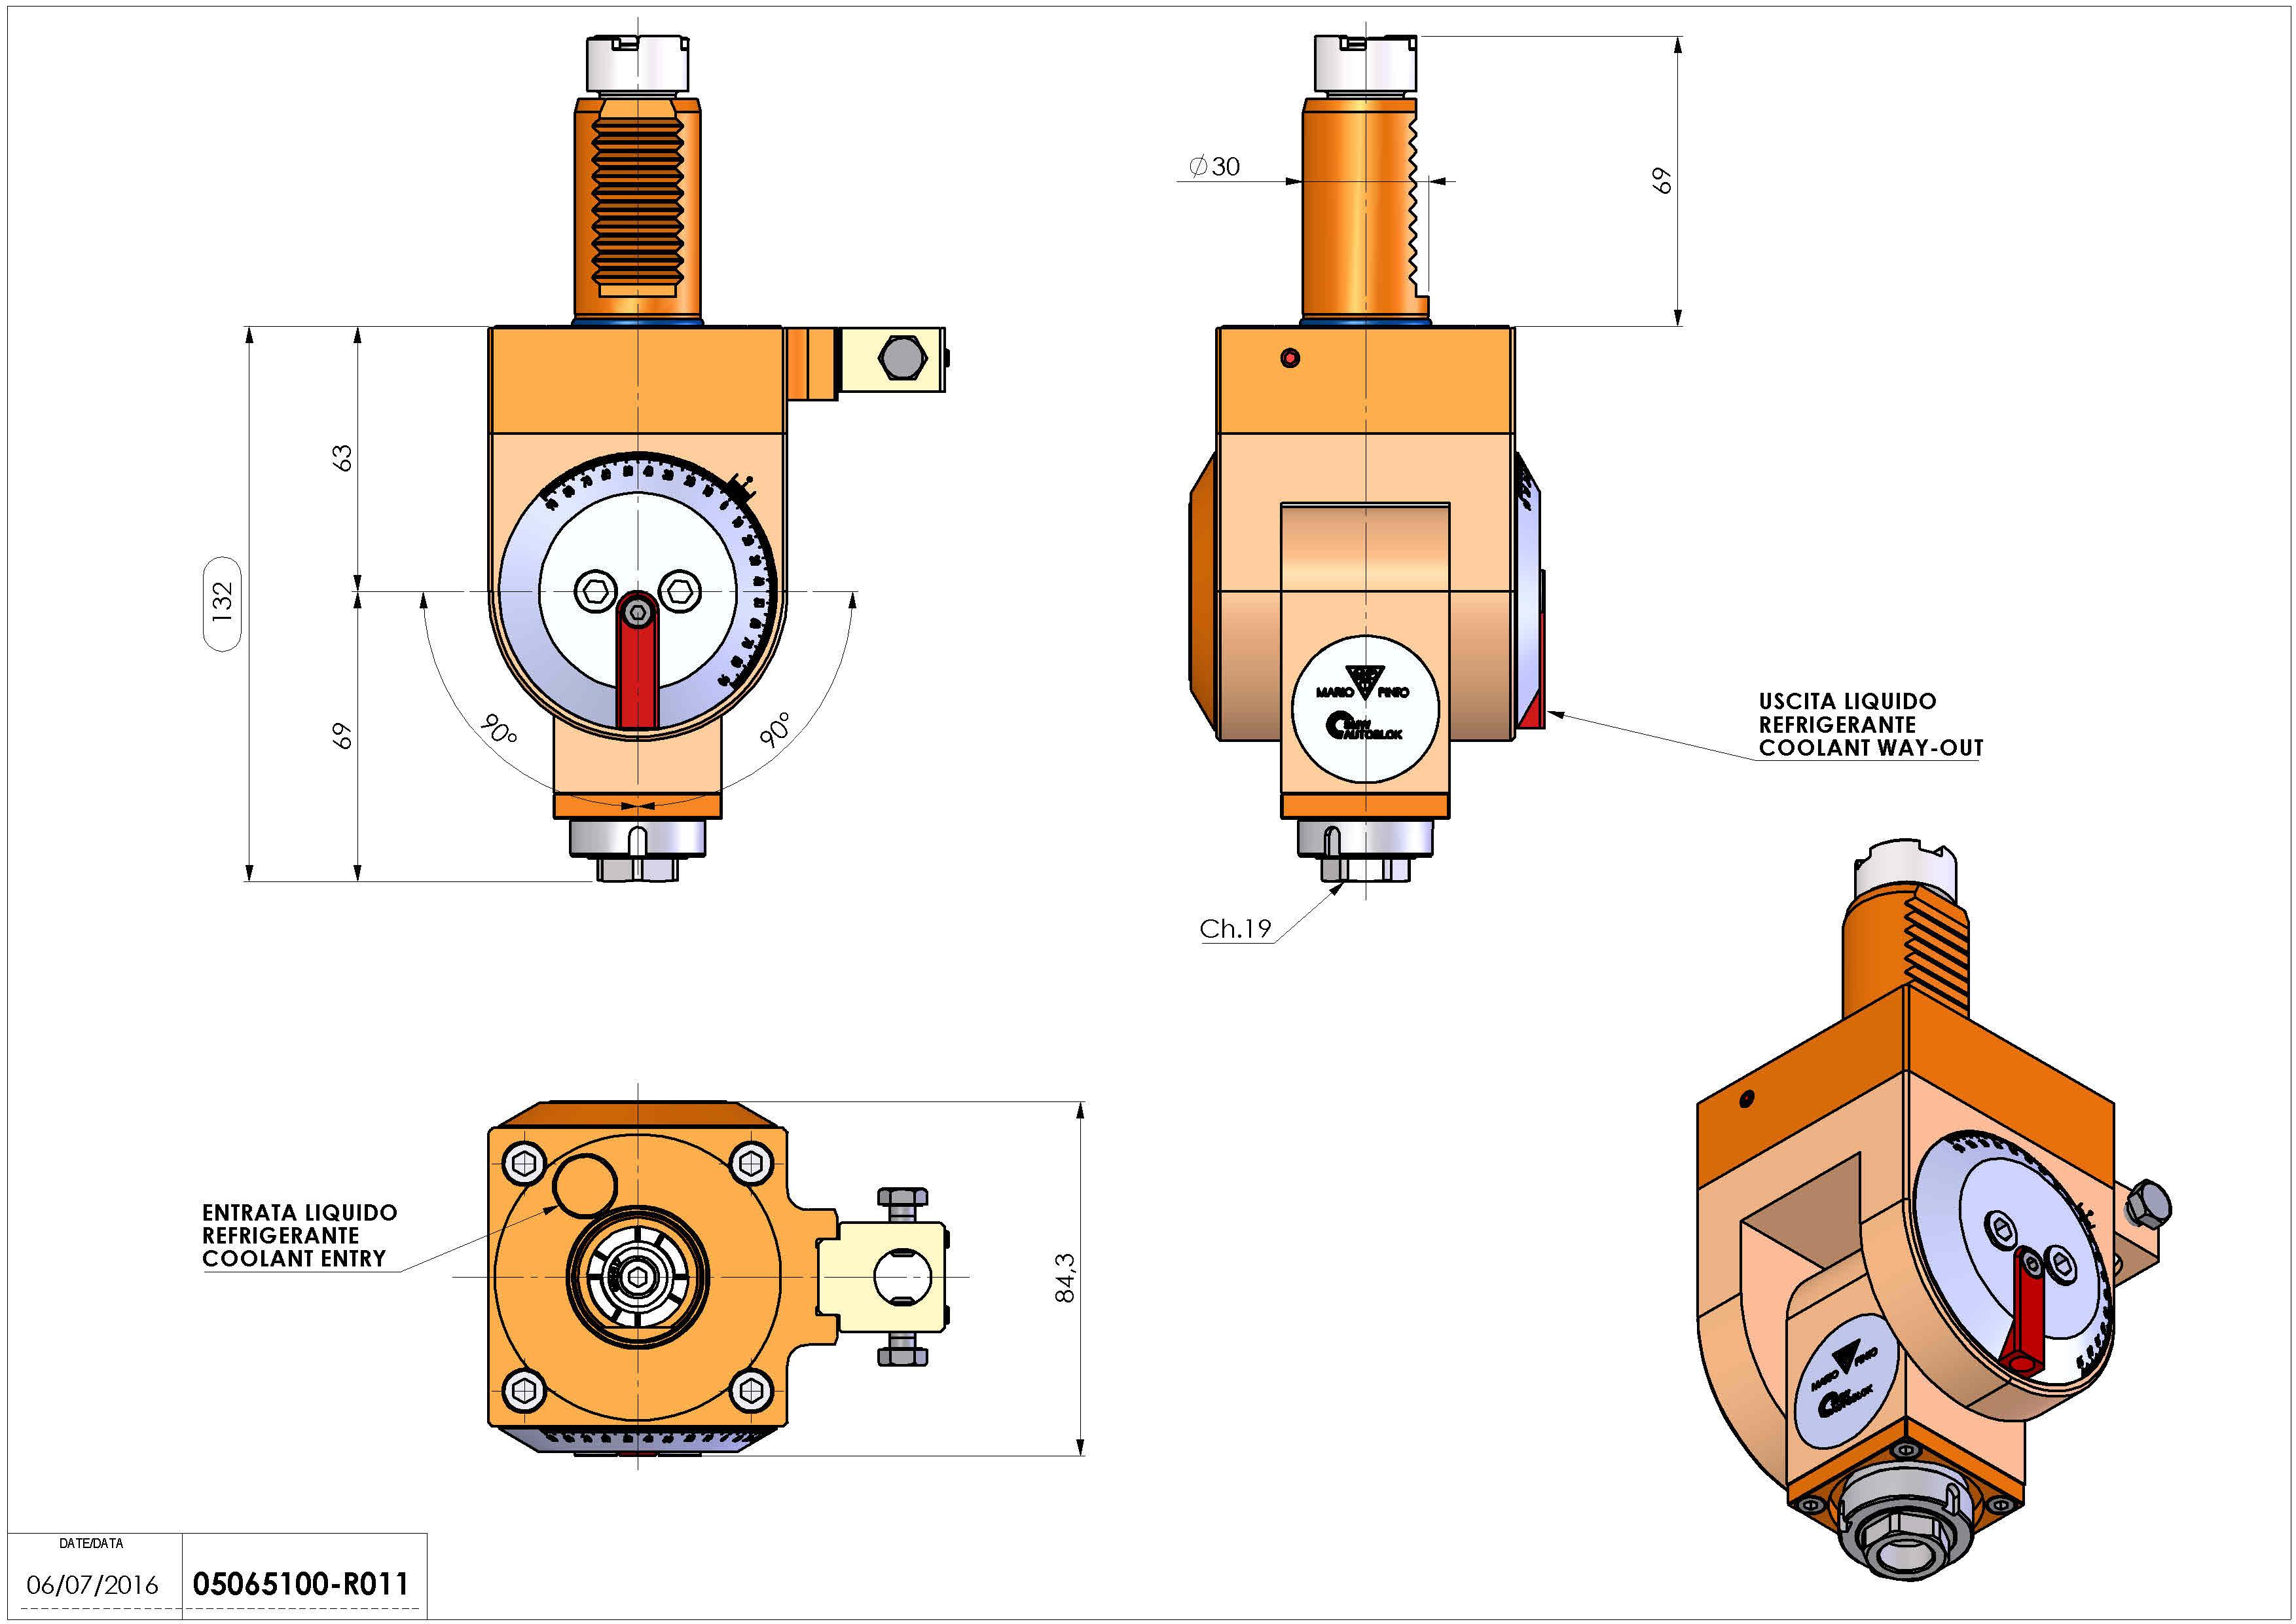 Technical image - LT-T VDI30 ER16F H63-132 F OK.